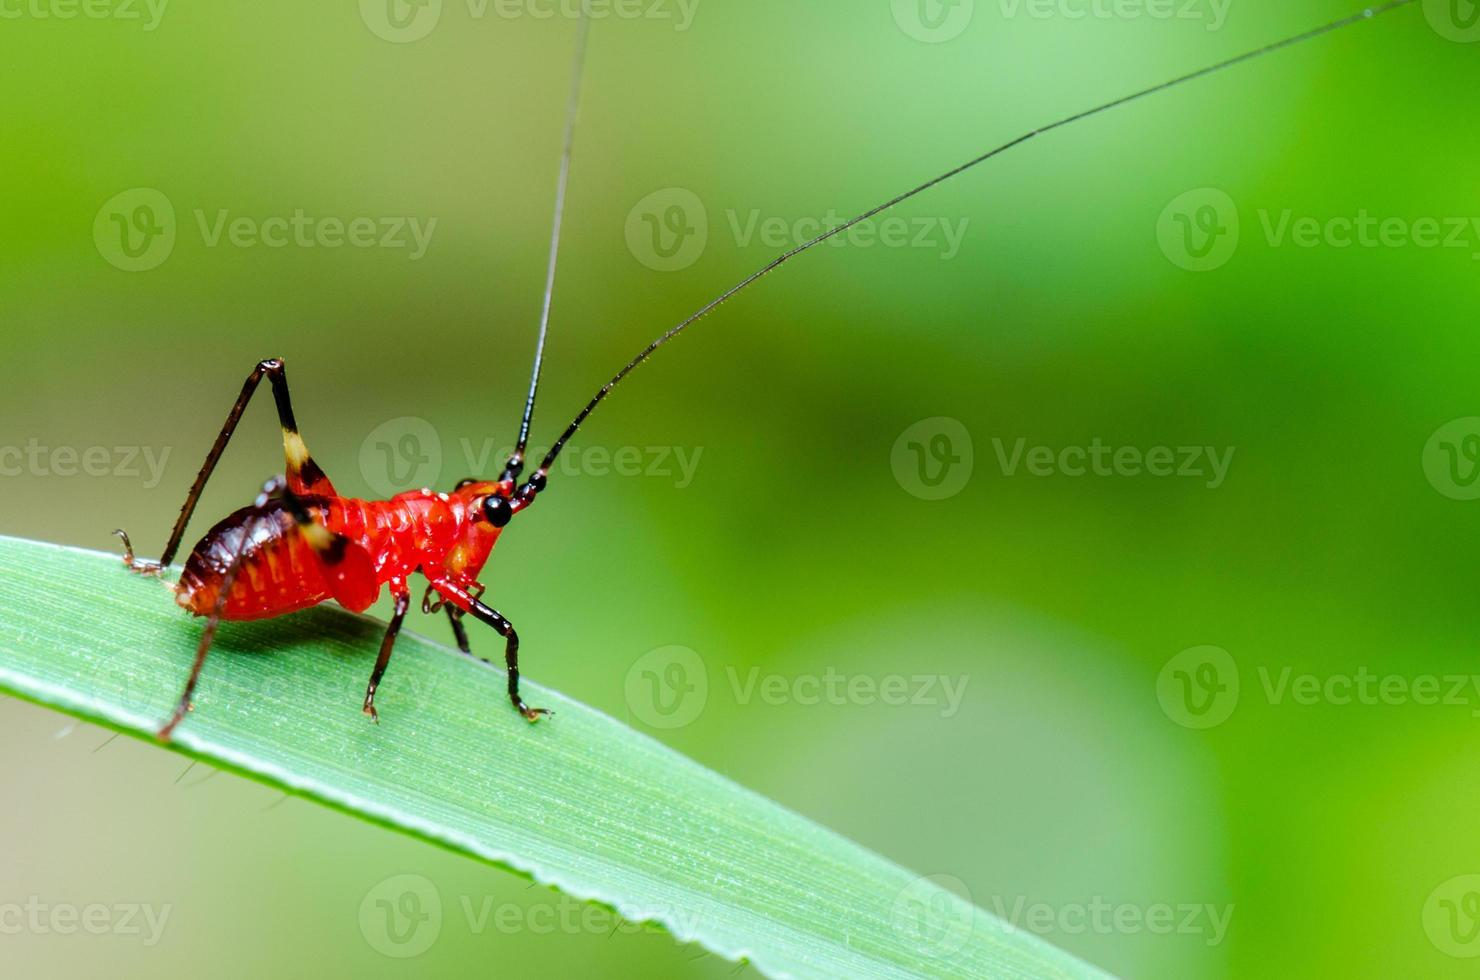 Conocephalus Melas tiny red Cricket photo